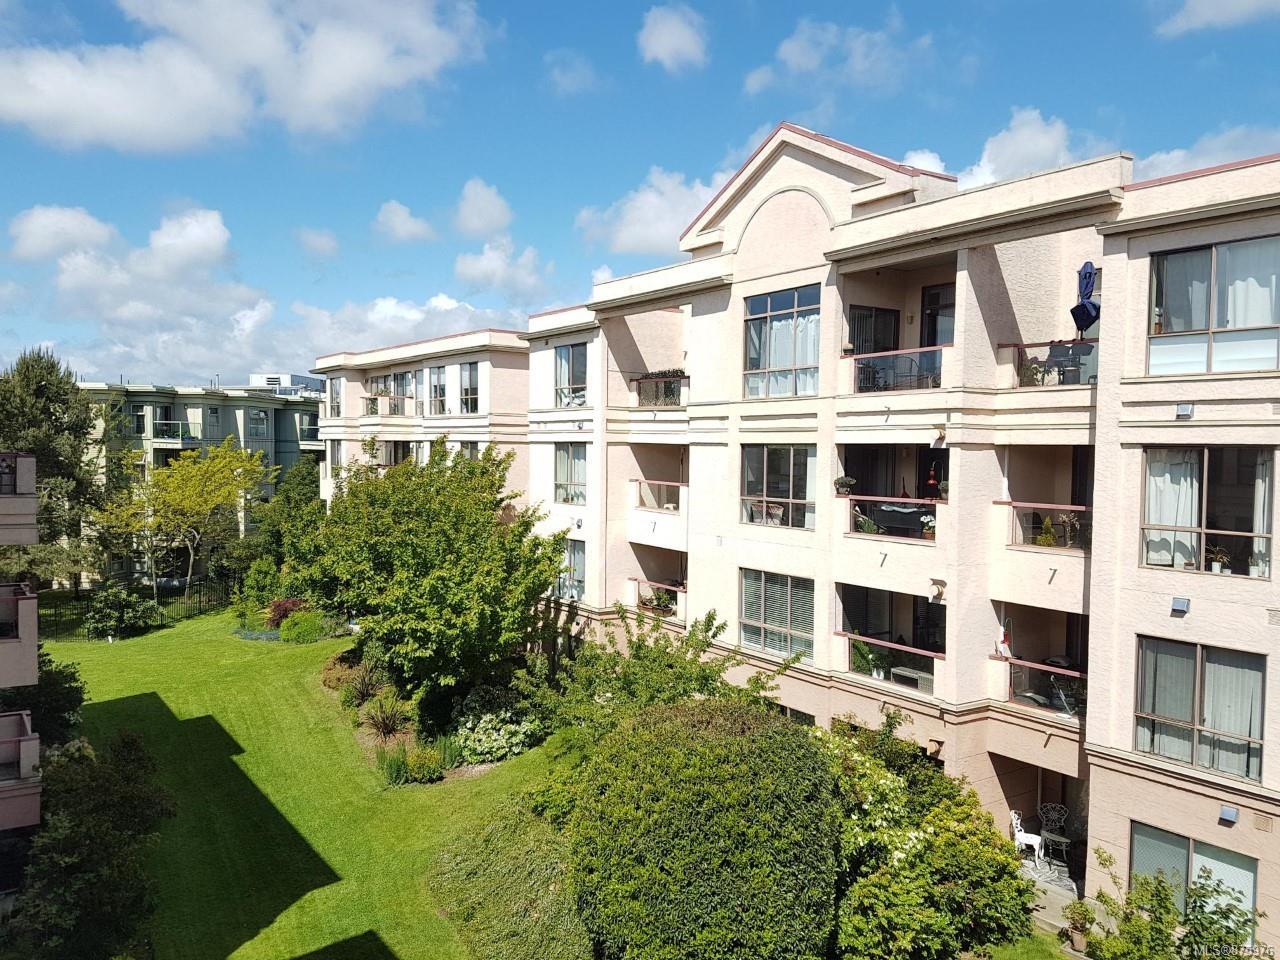 407 - 520 Dunedin Street, Burnside, Victoria